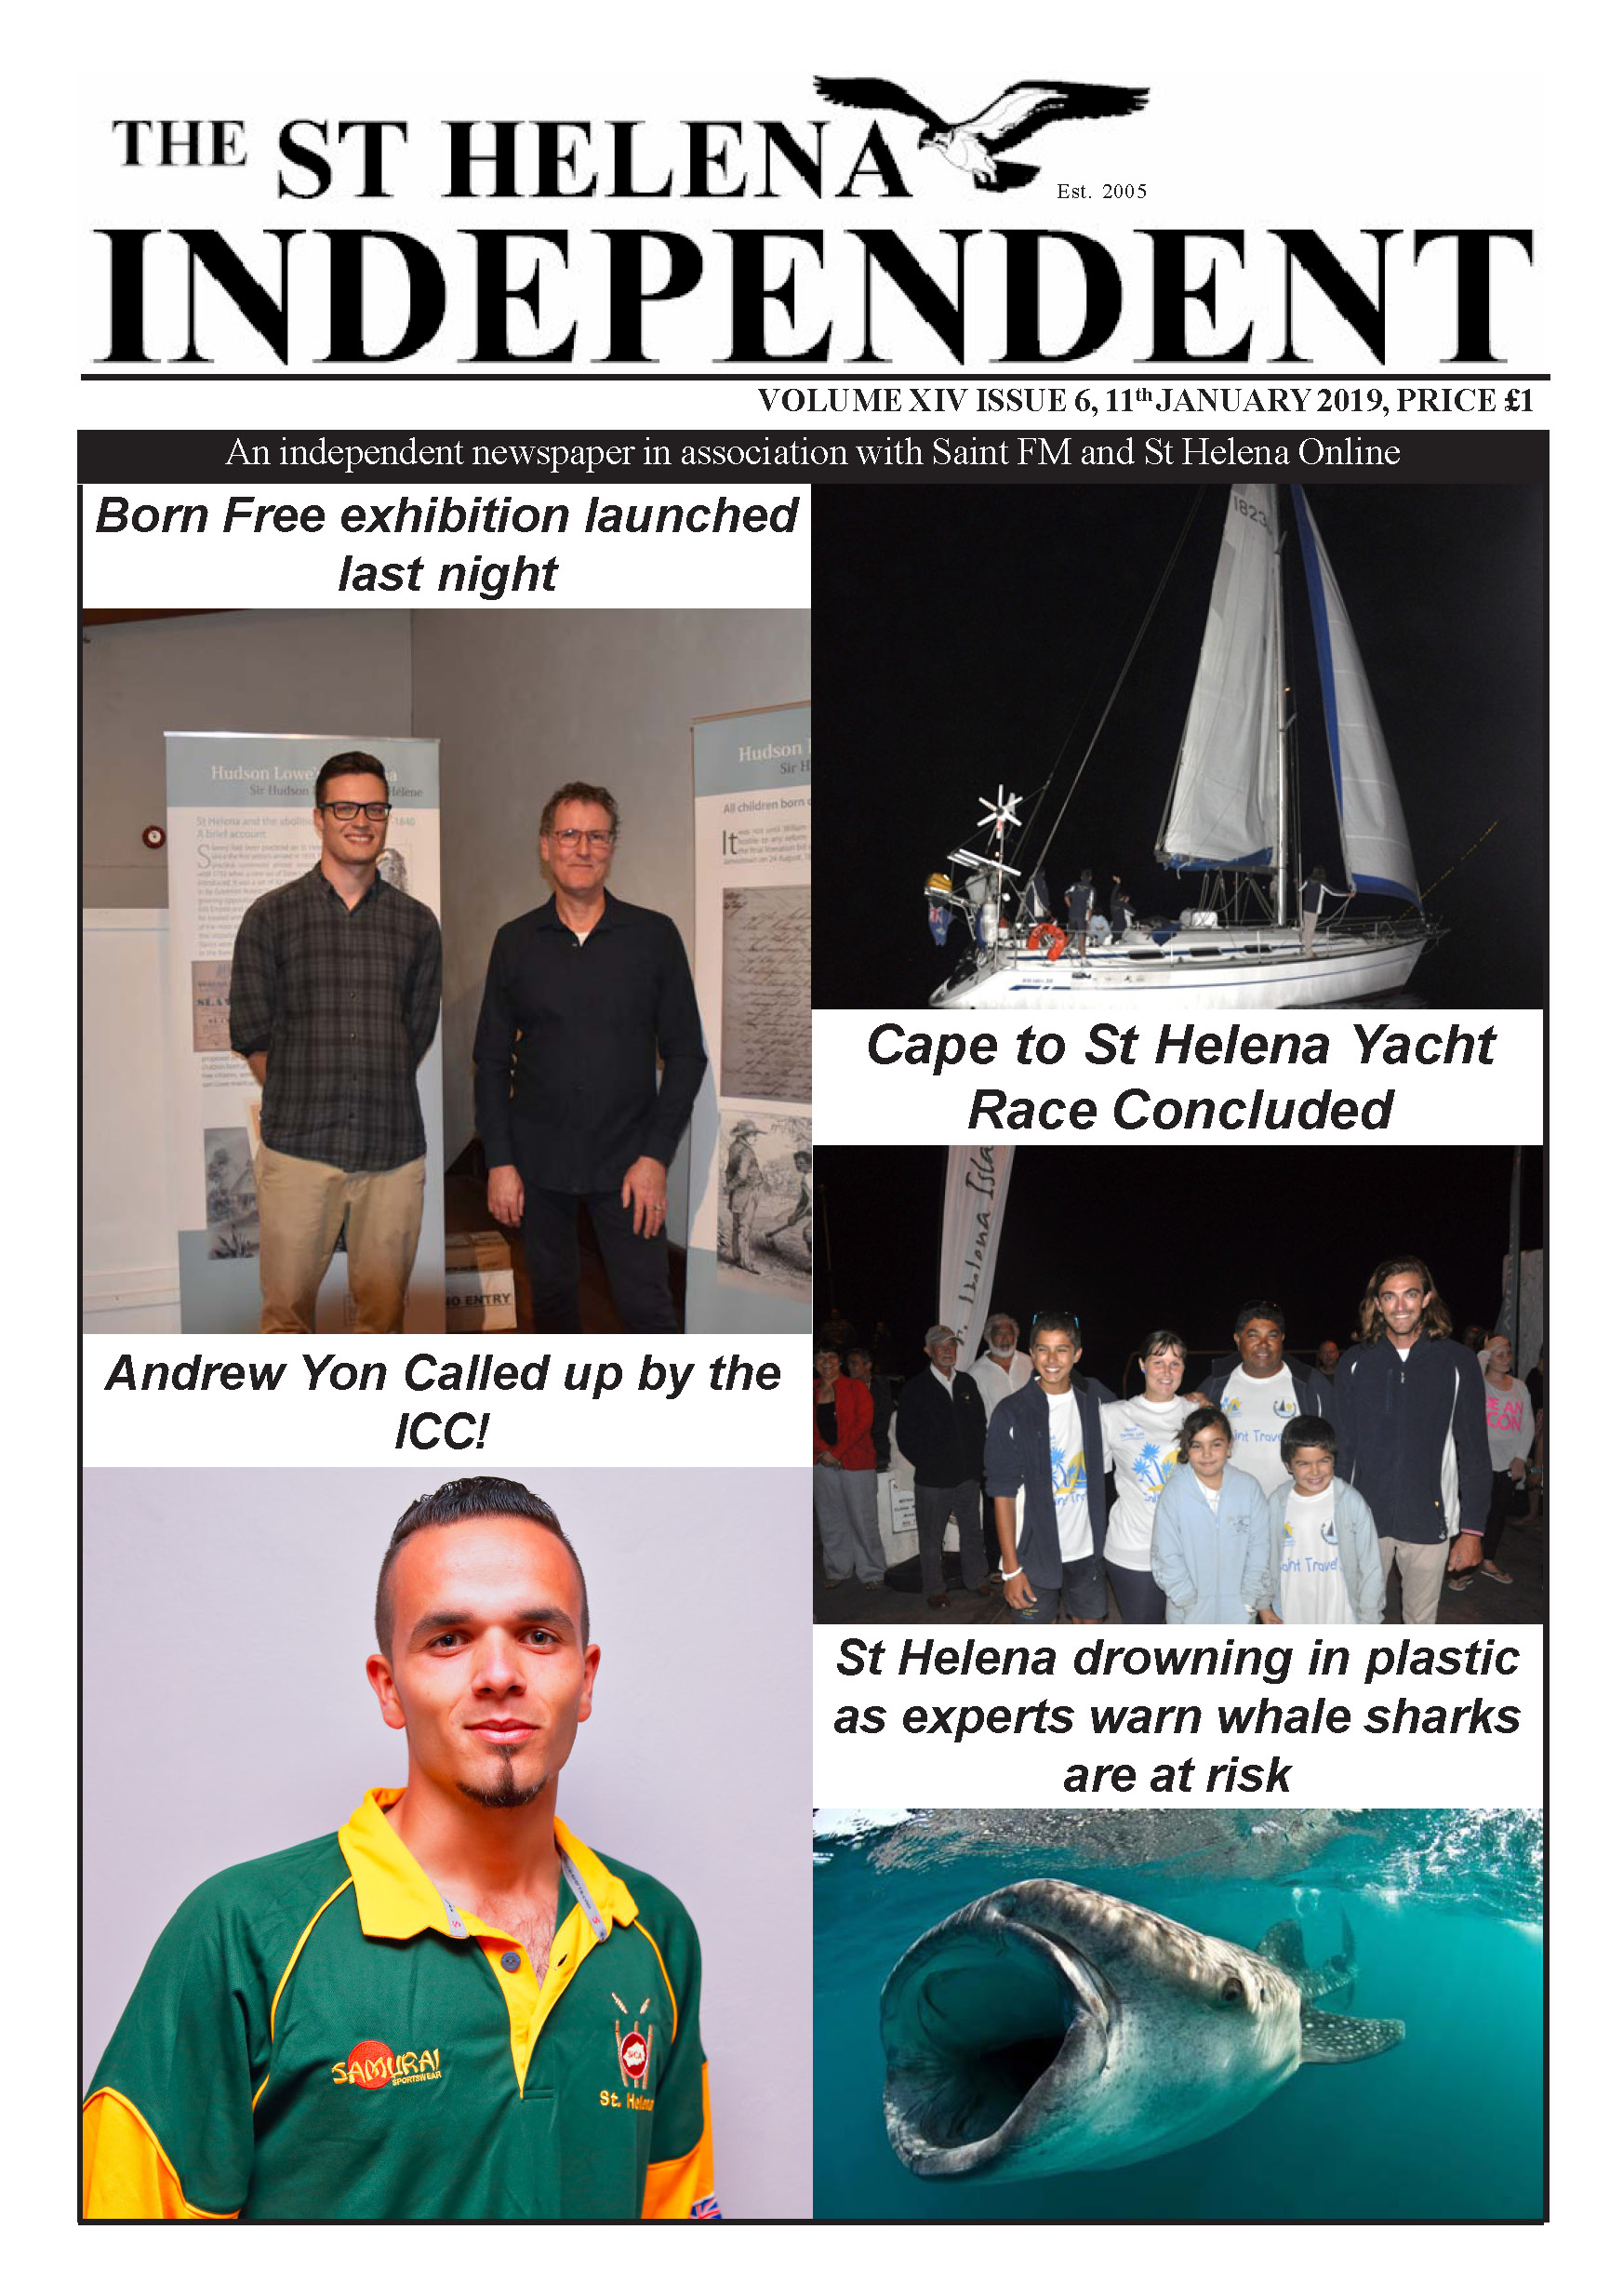 St Helena Independent 20190111